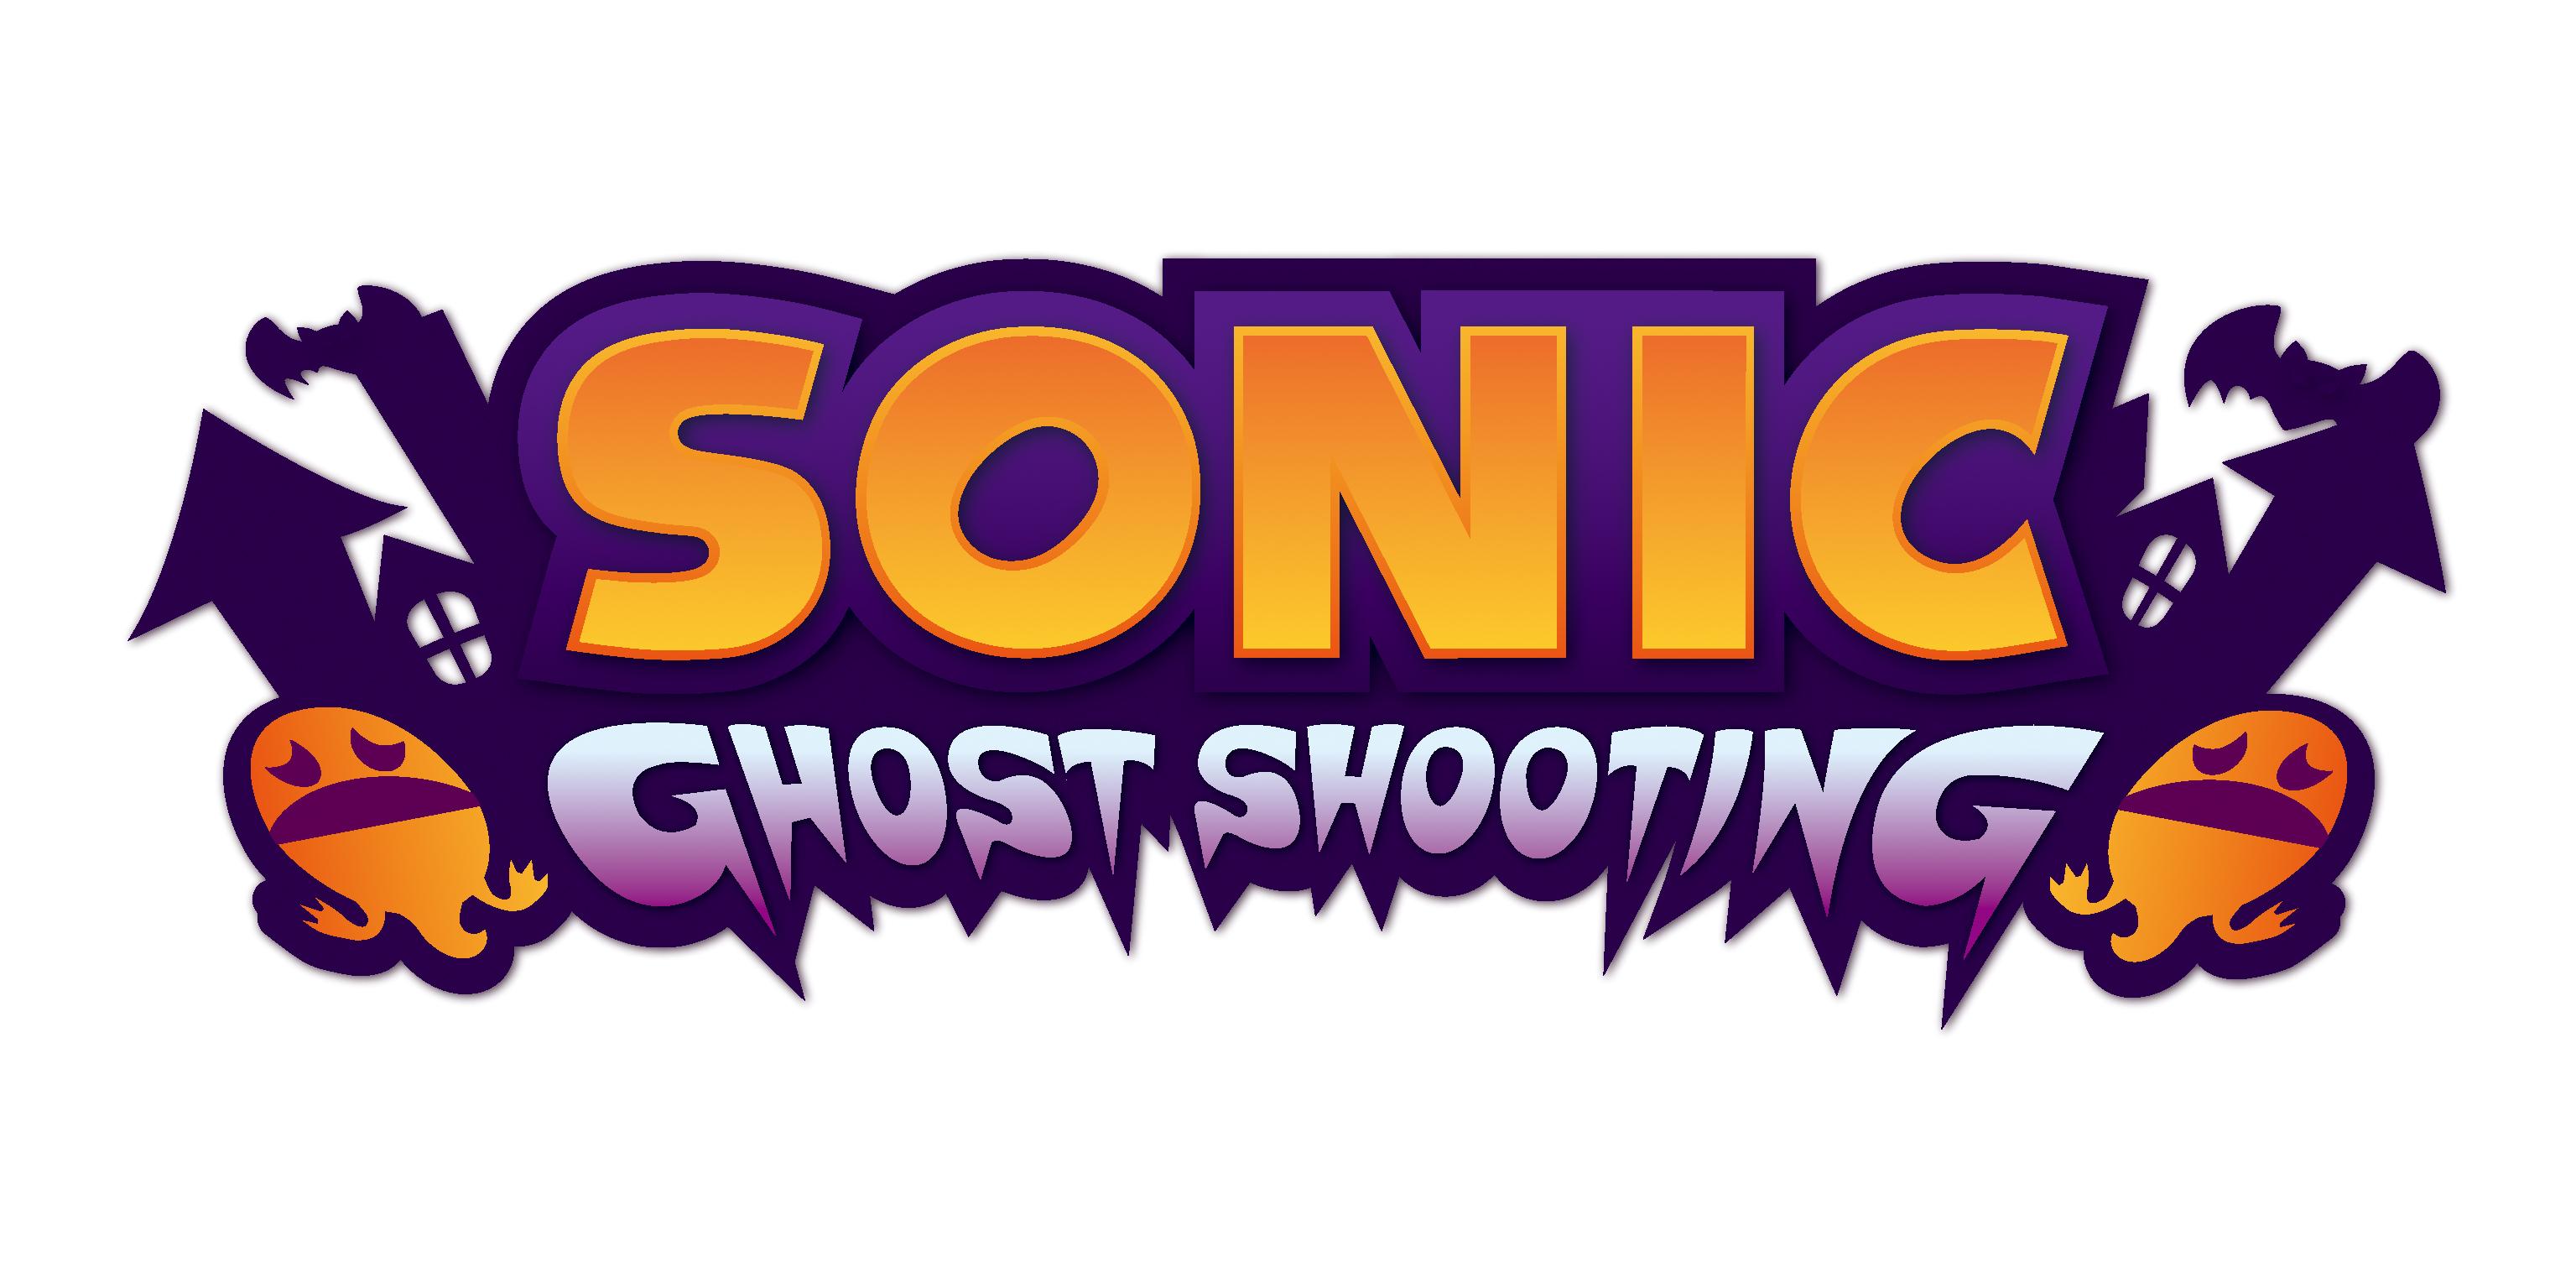 File:Sonic Ghost Shooting Logo.jpg